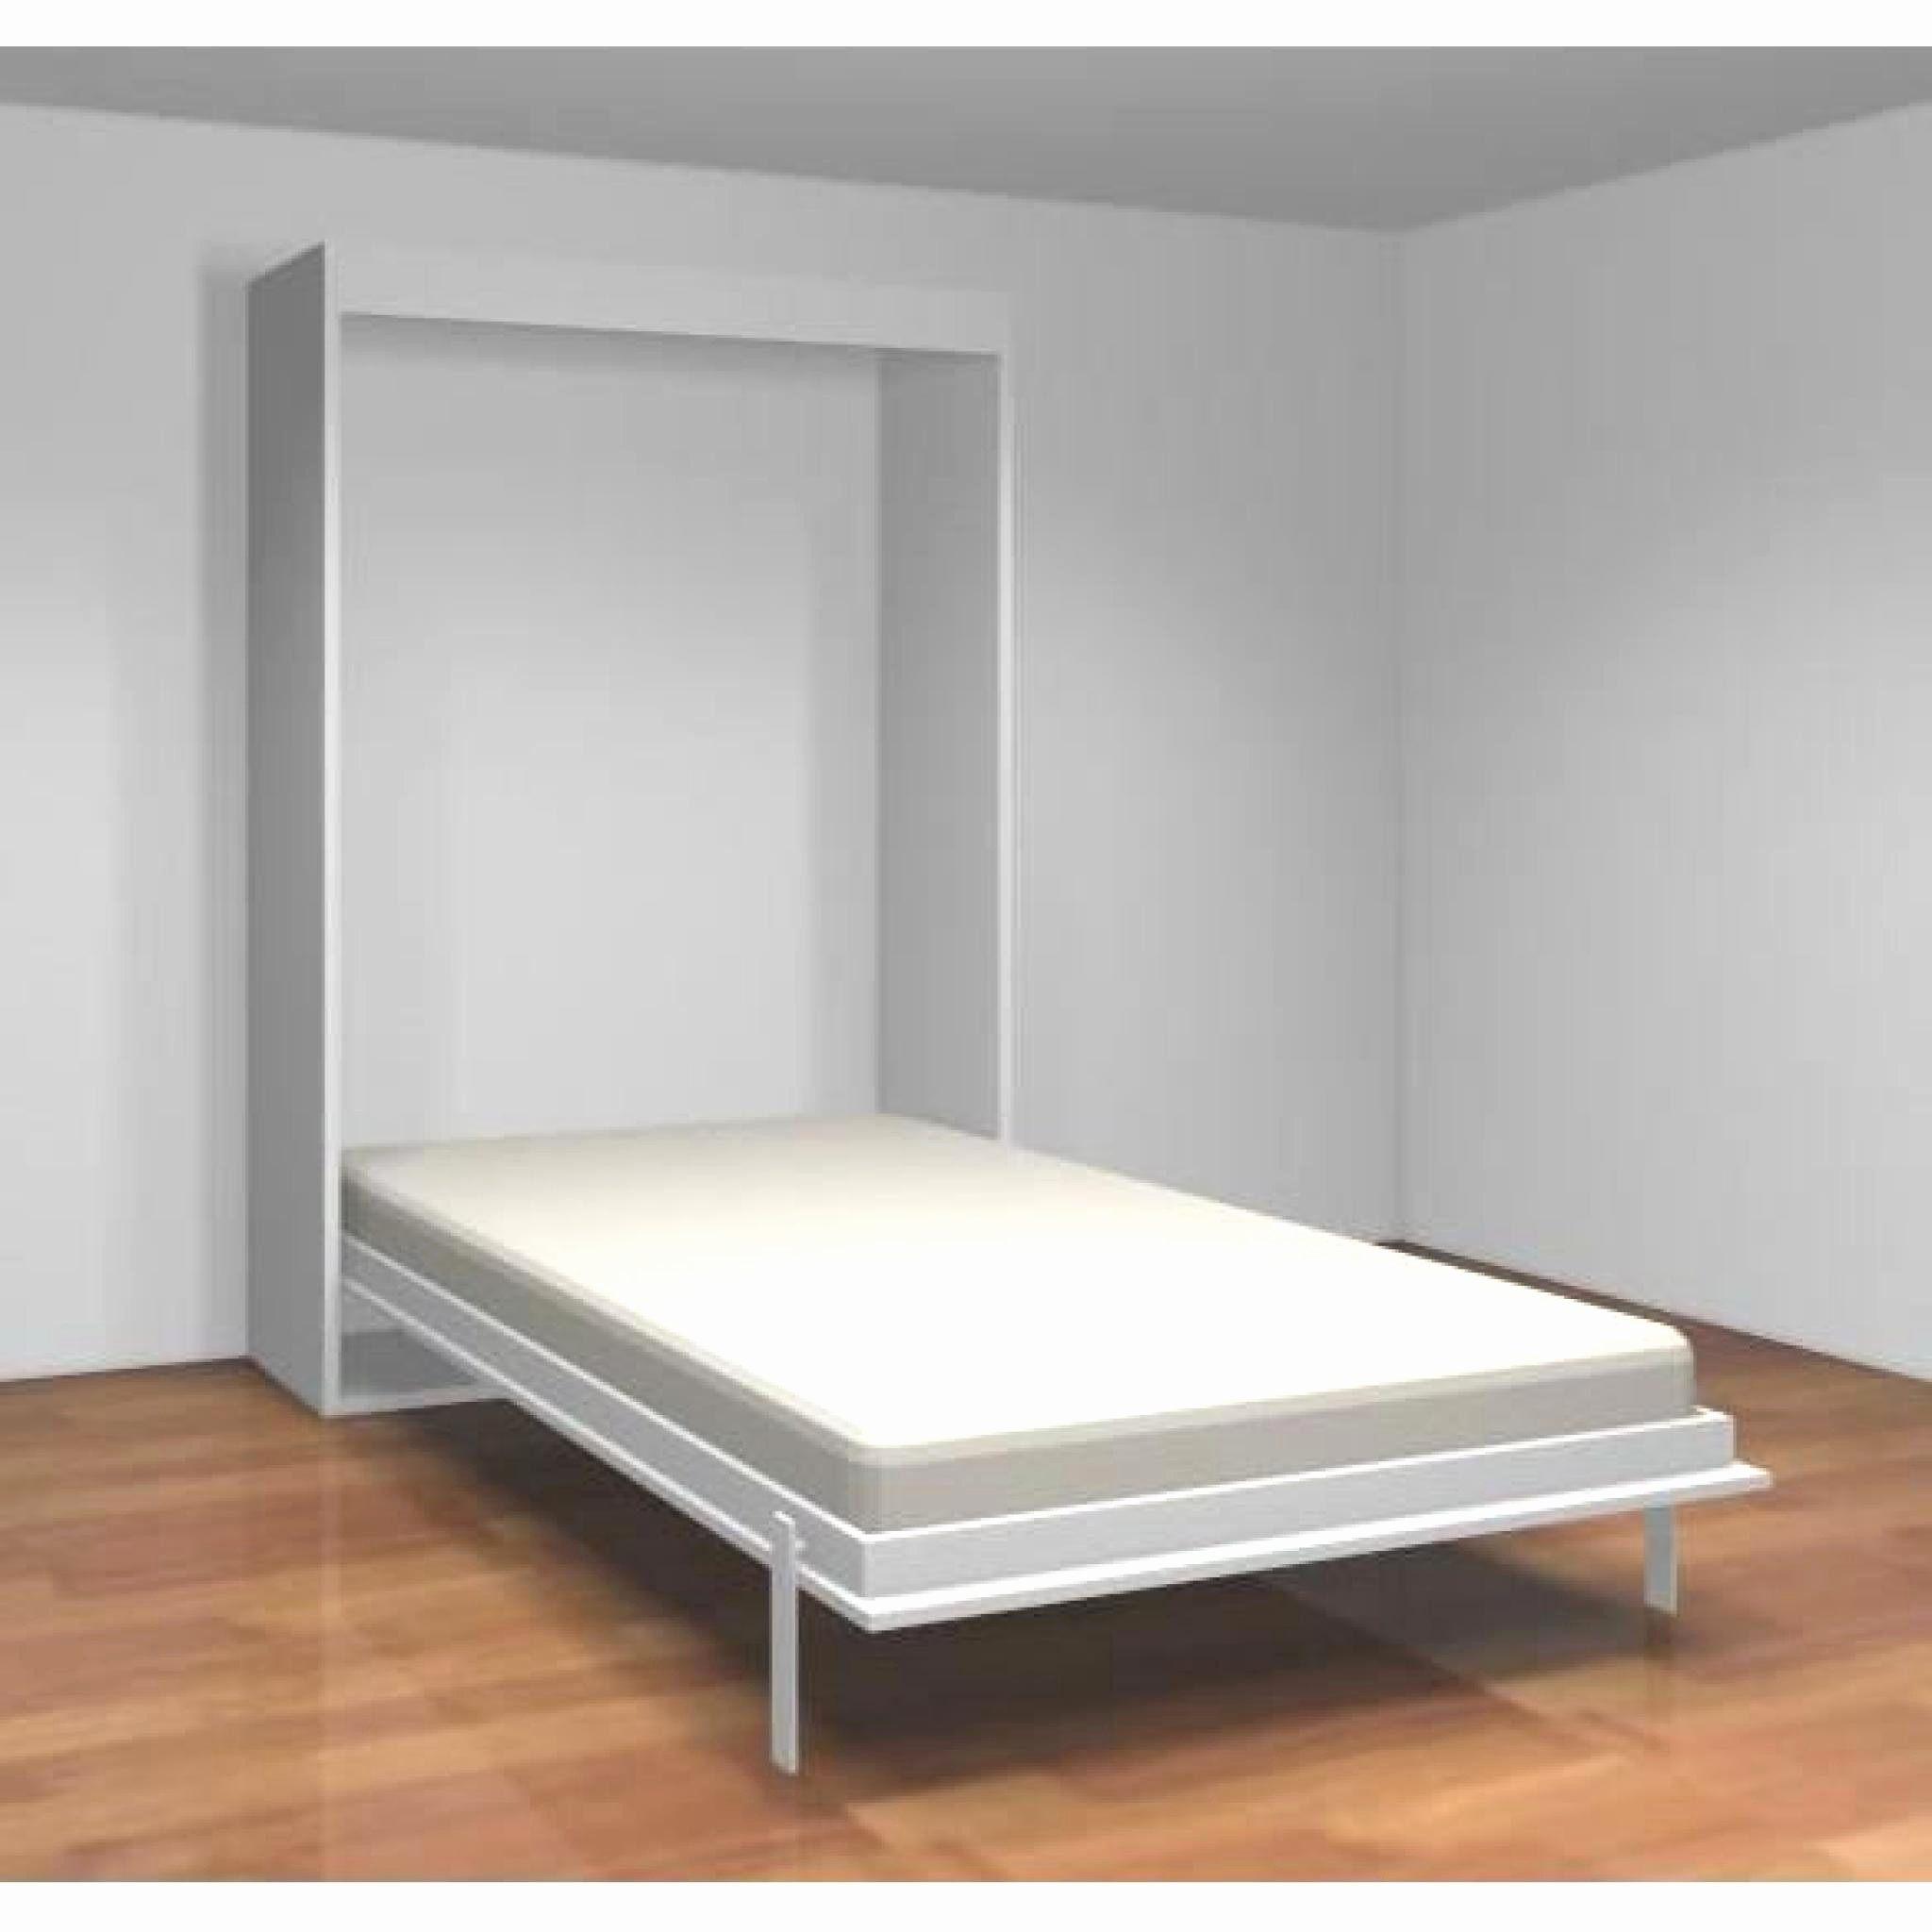 Lit Mezzanine Metal Bel Lit Mezzanine Armoire Einzigartig Lit Mezzanine Avec Bureau